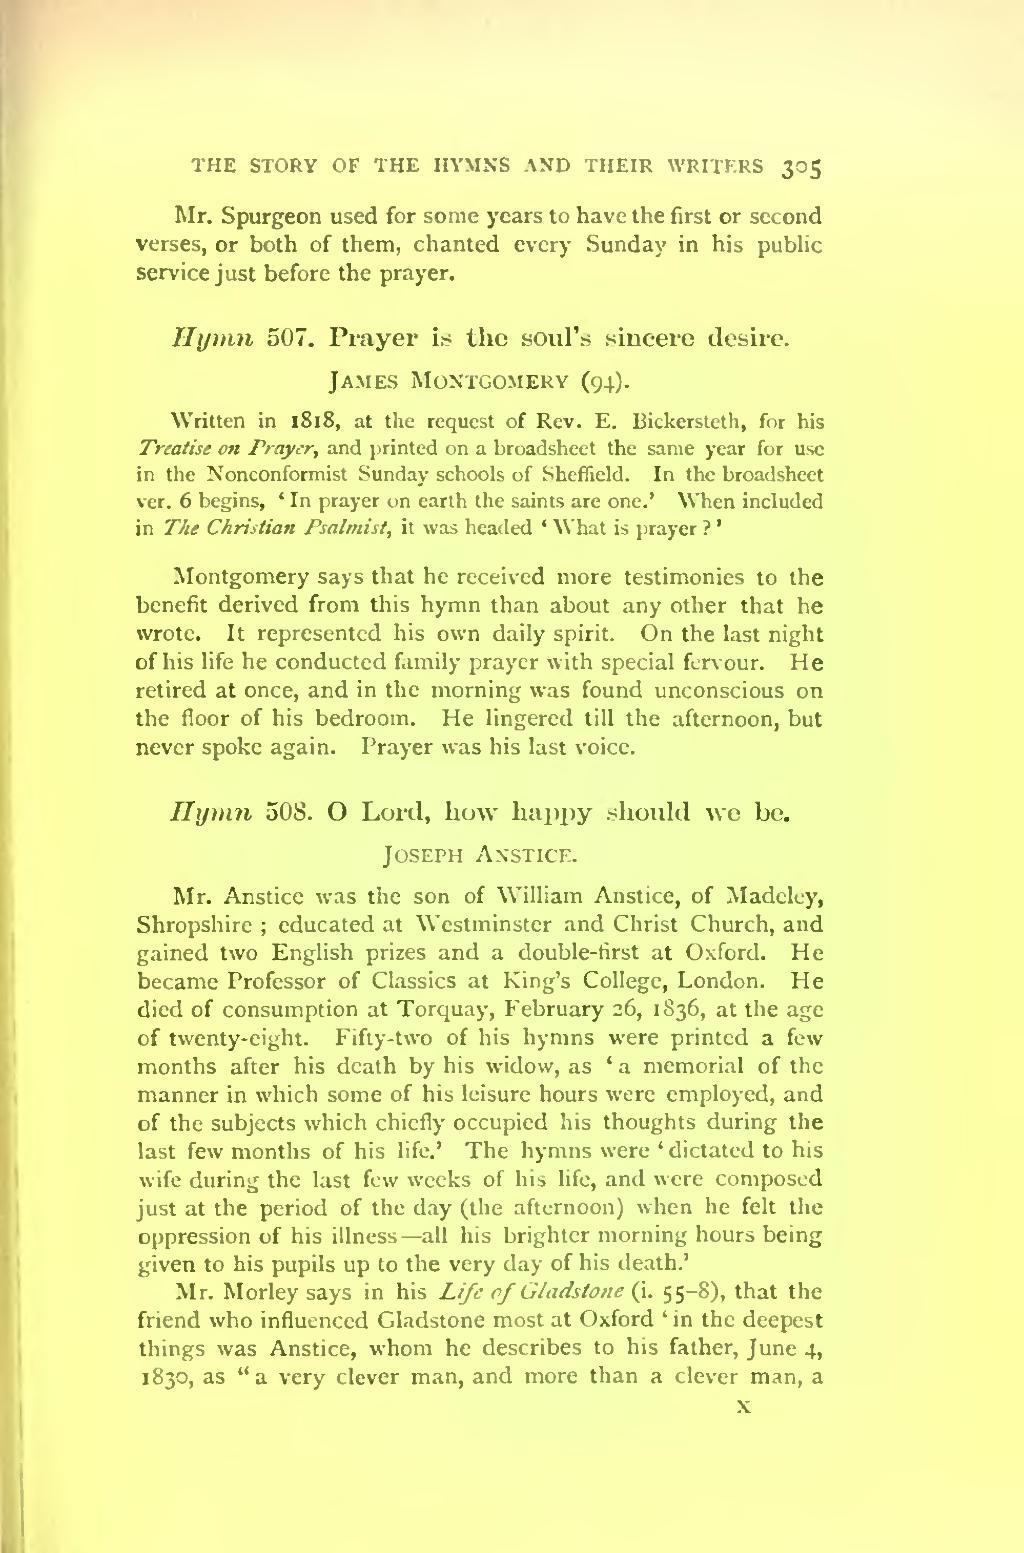 methodist hymn book download pdf